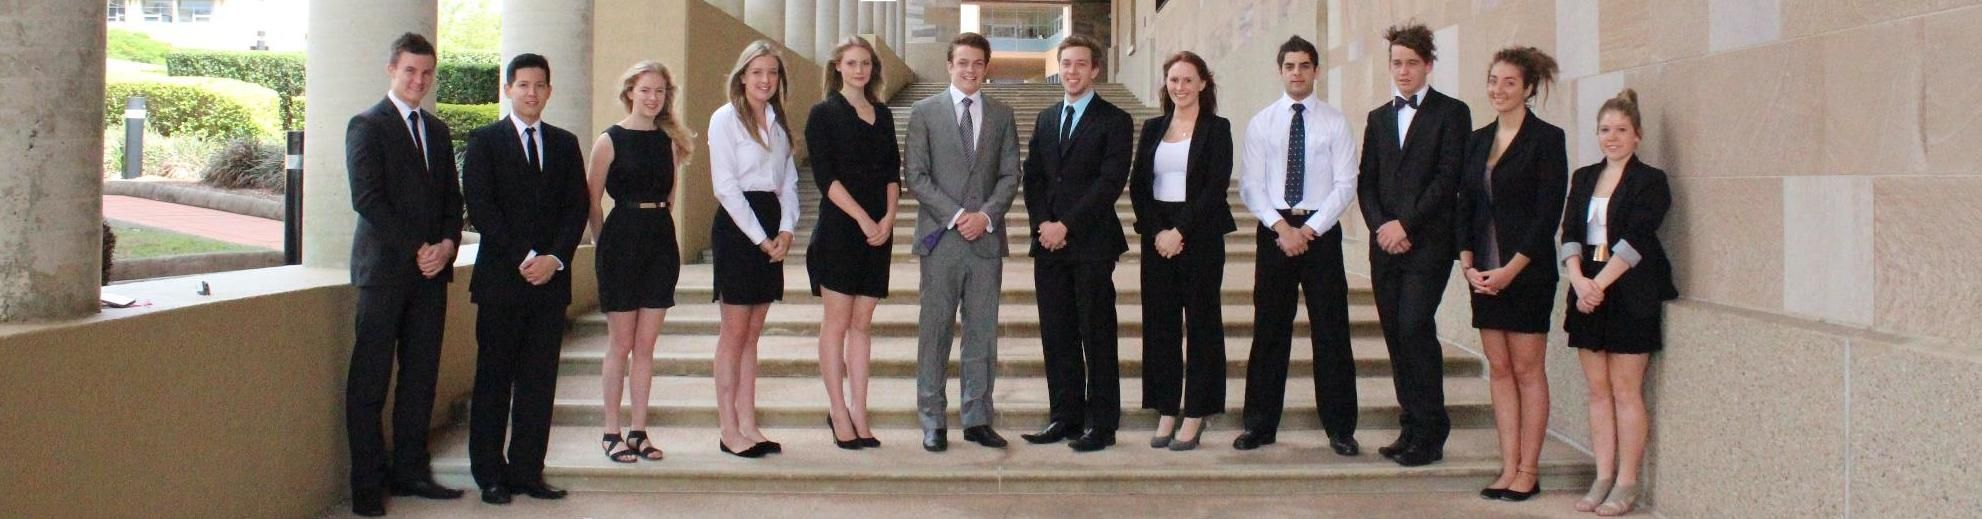 Bond university health science and medicine students